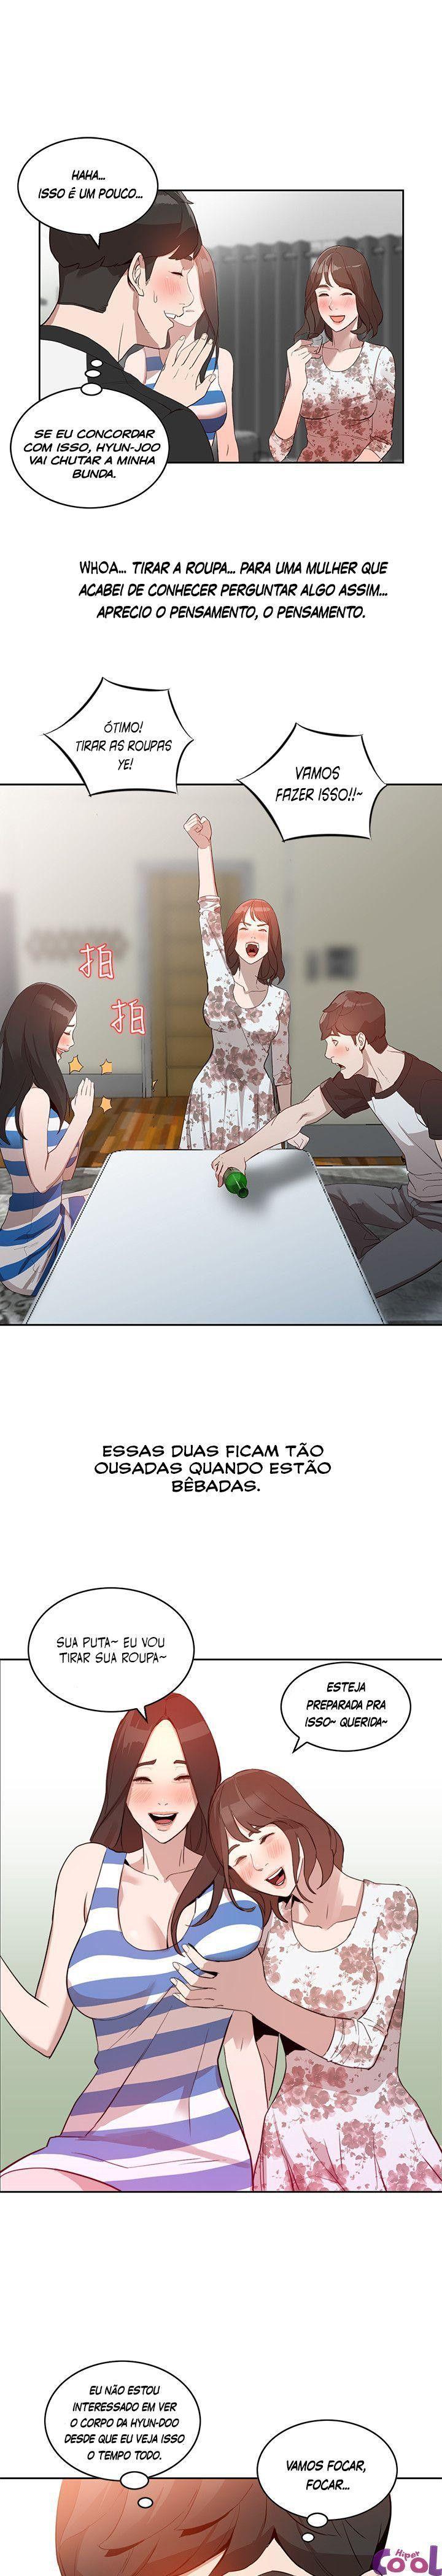 Mulher Casada 02 - Foto 2